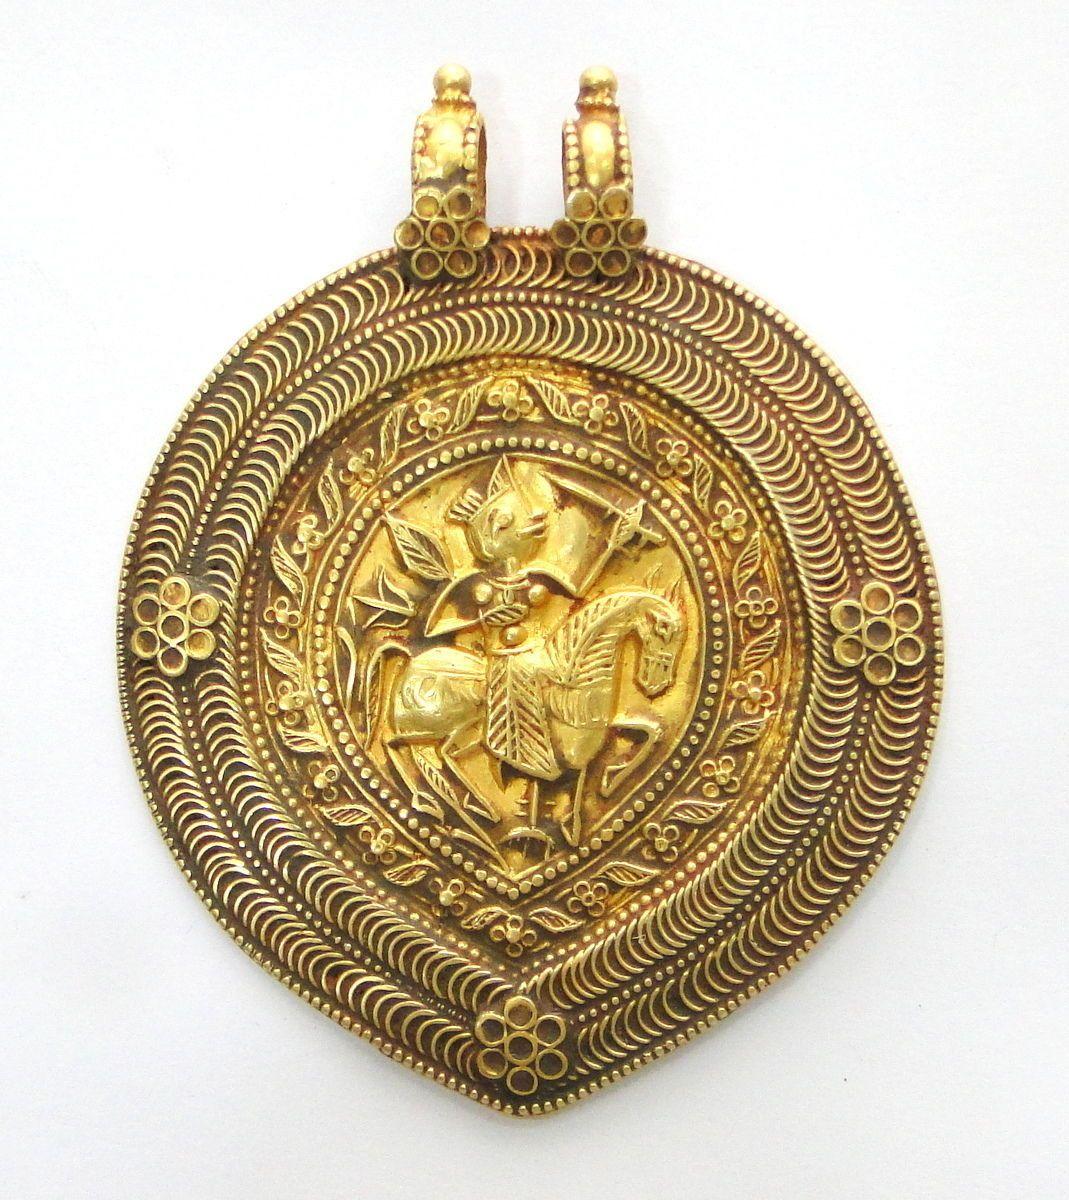 Rare Ancient Antique Collectible Solid 23k Gold Amulet Pendant Necklace India Pendant Necklace Amulet Ancient Jewelry